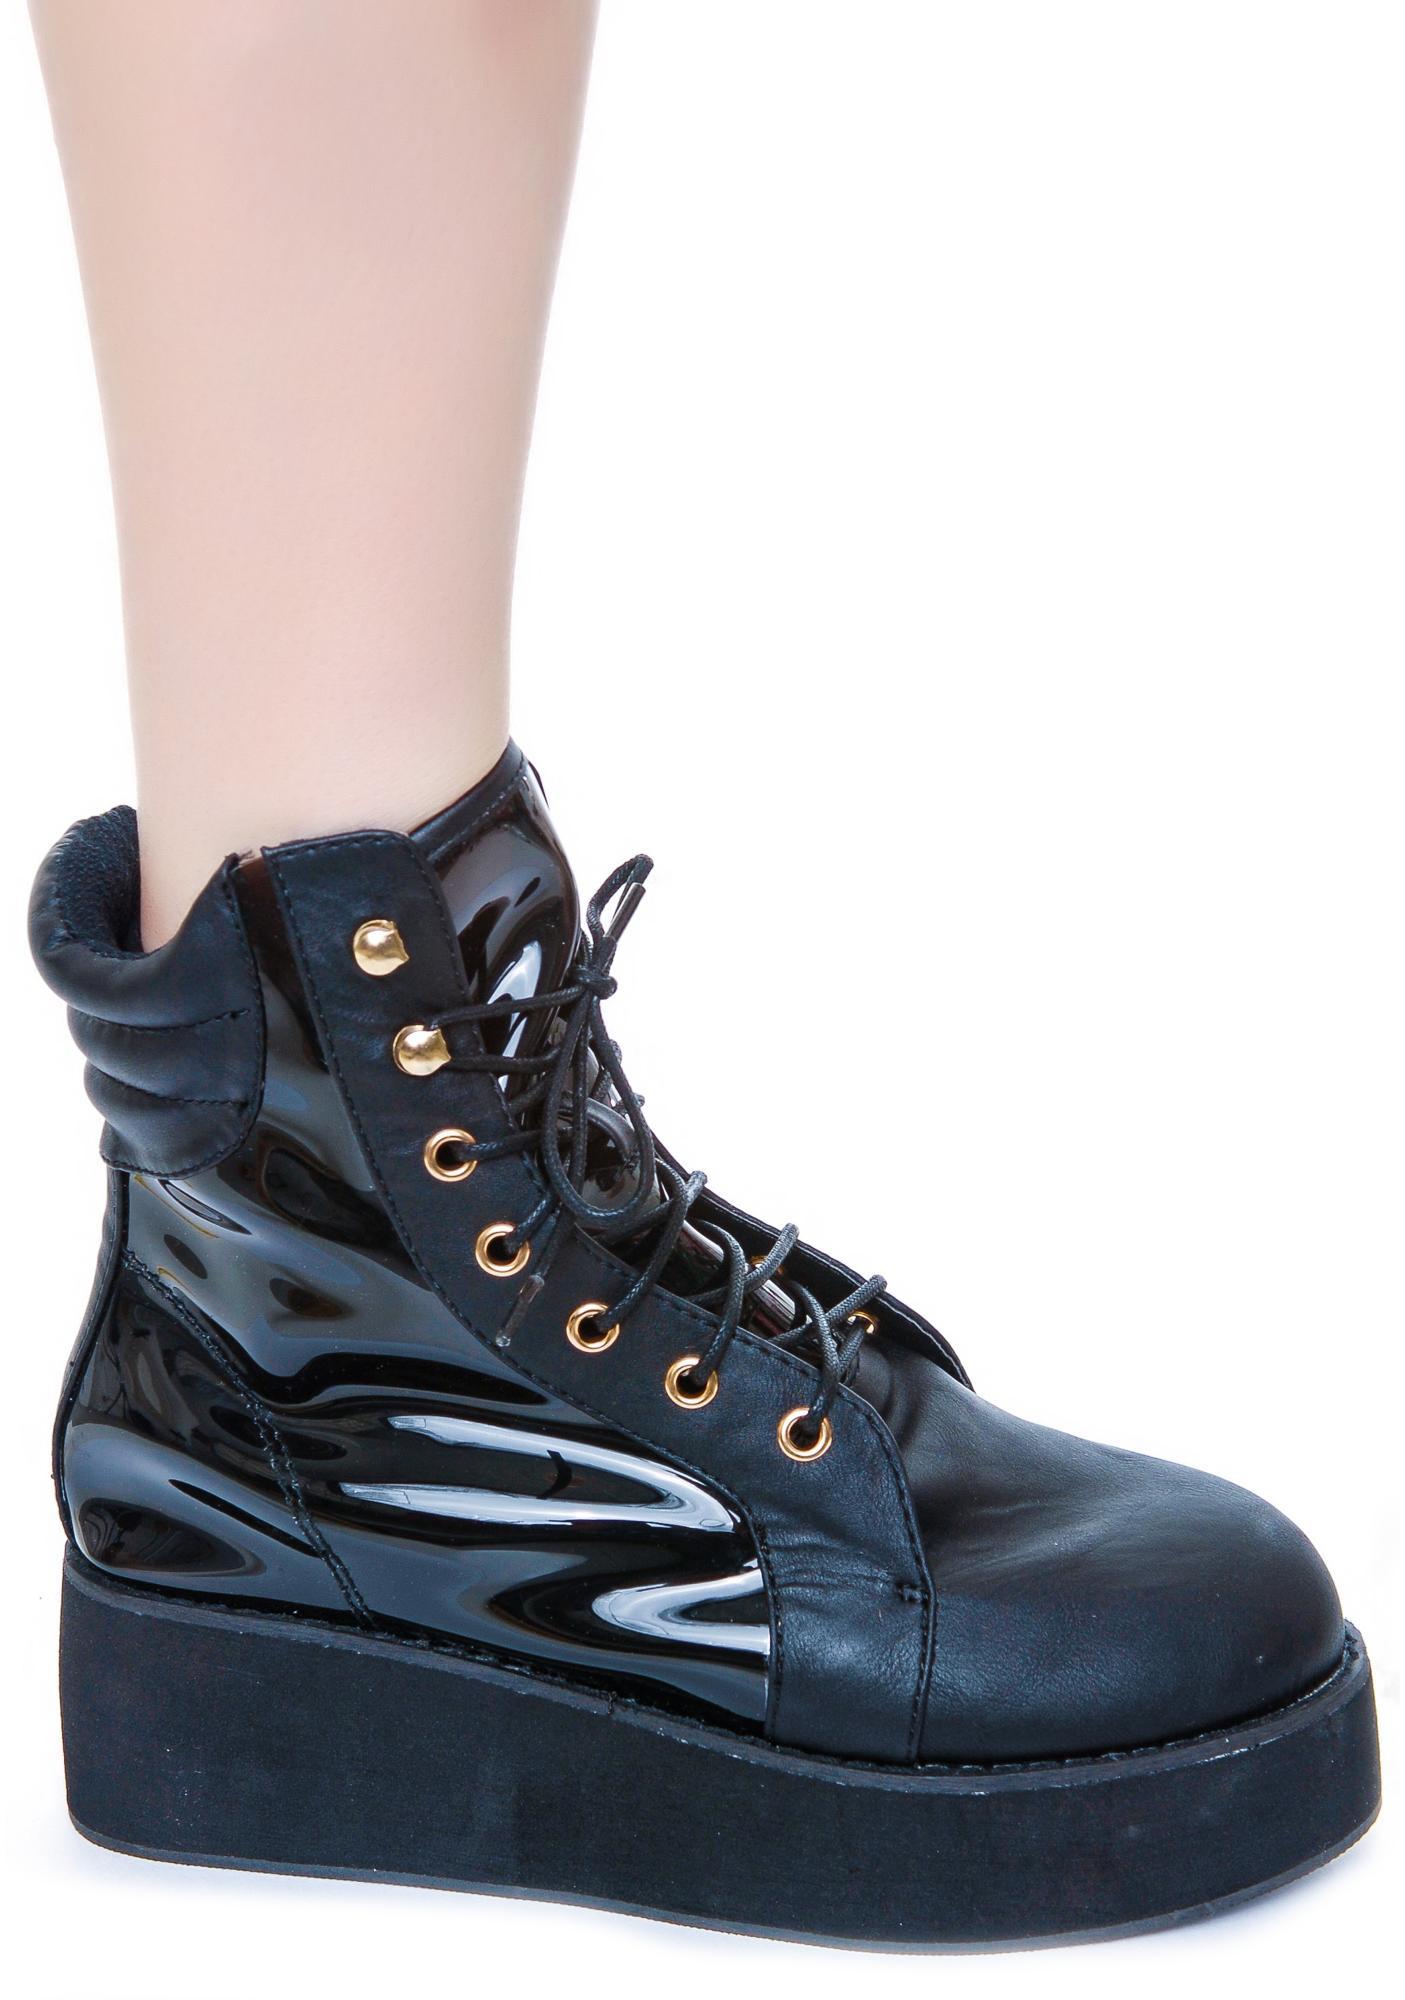 Y.R.U. Raze Boots